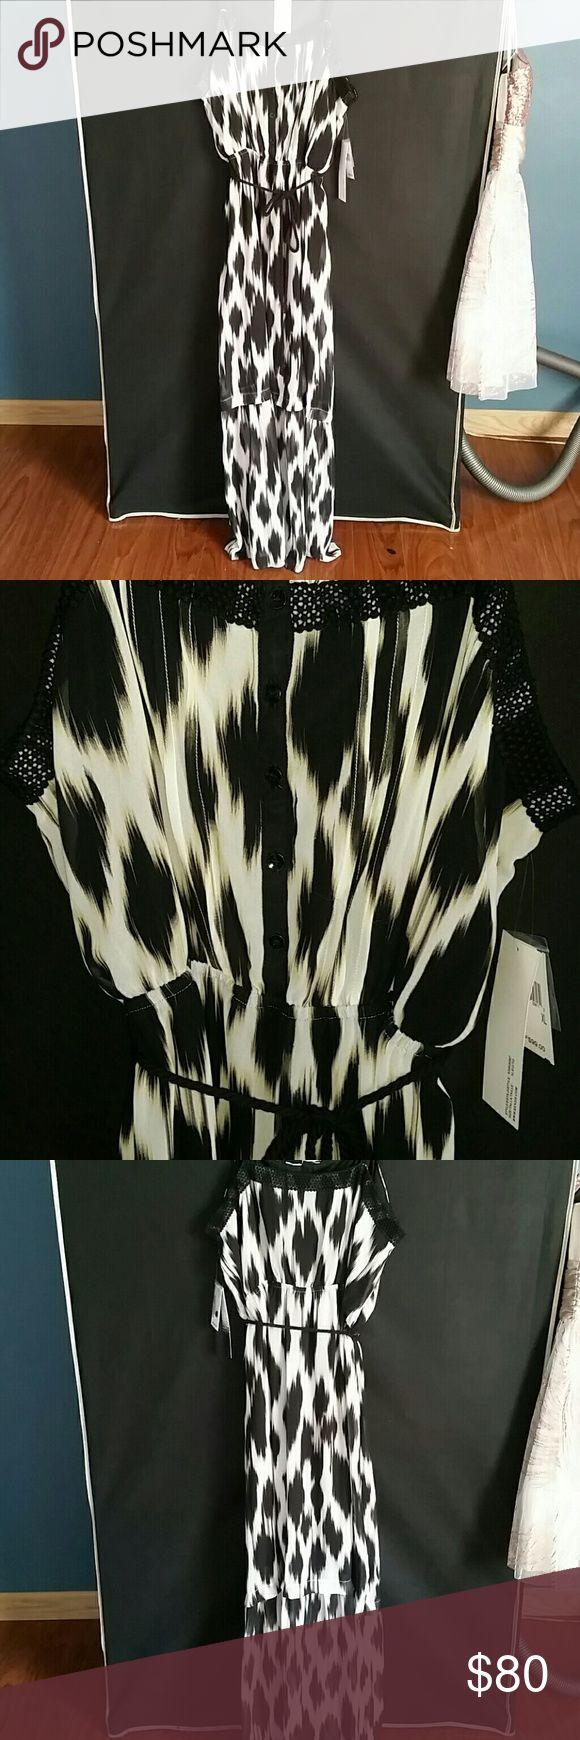 Long Maxi summer dress Black, white and beige summer dress Kensie Dresses Maxi